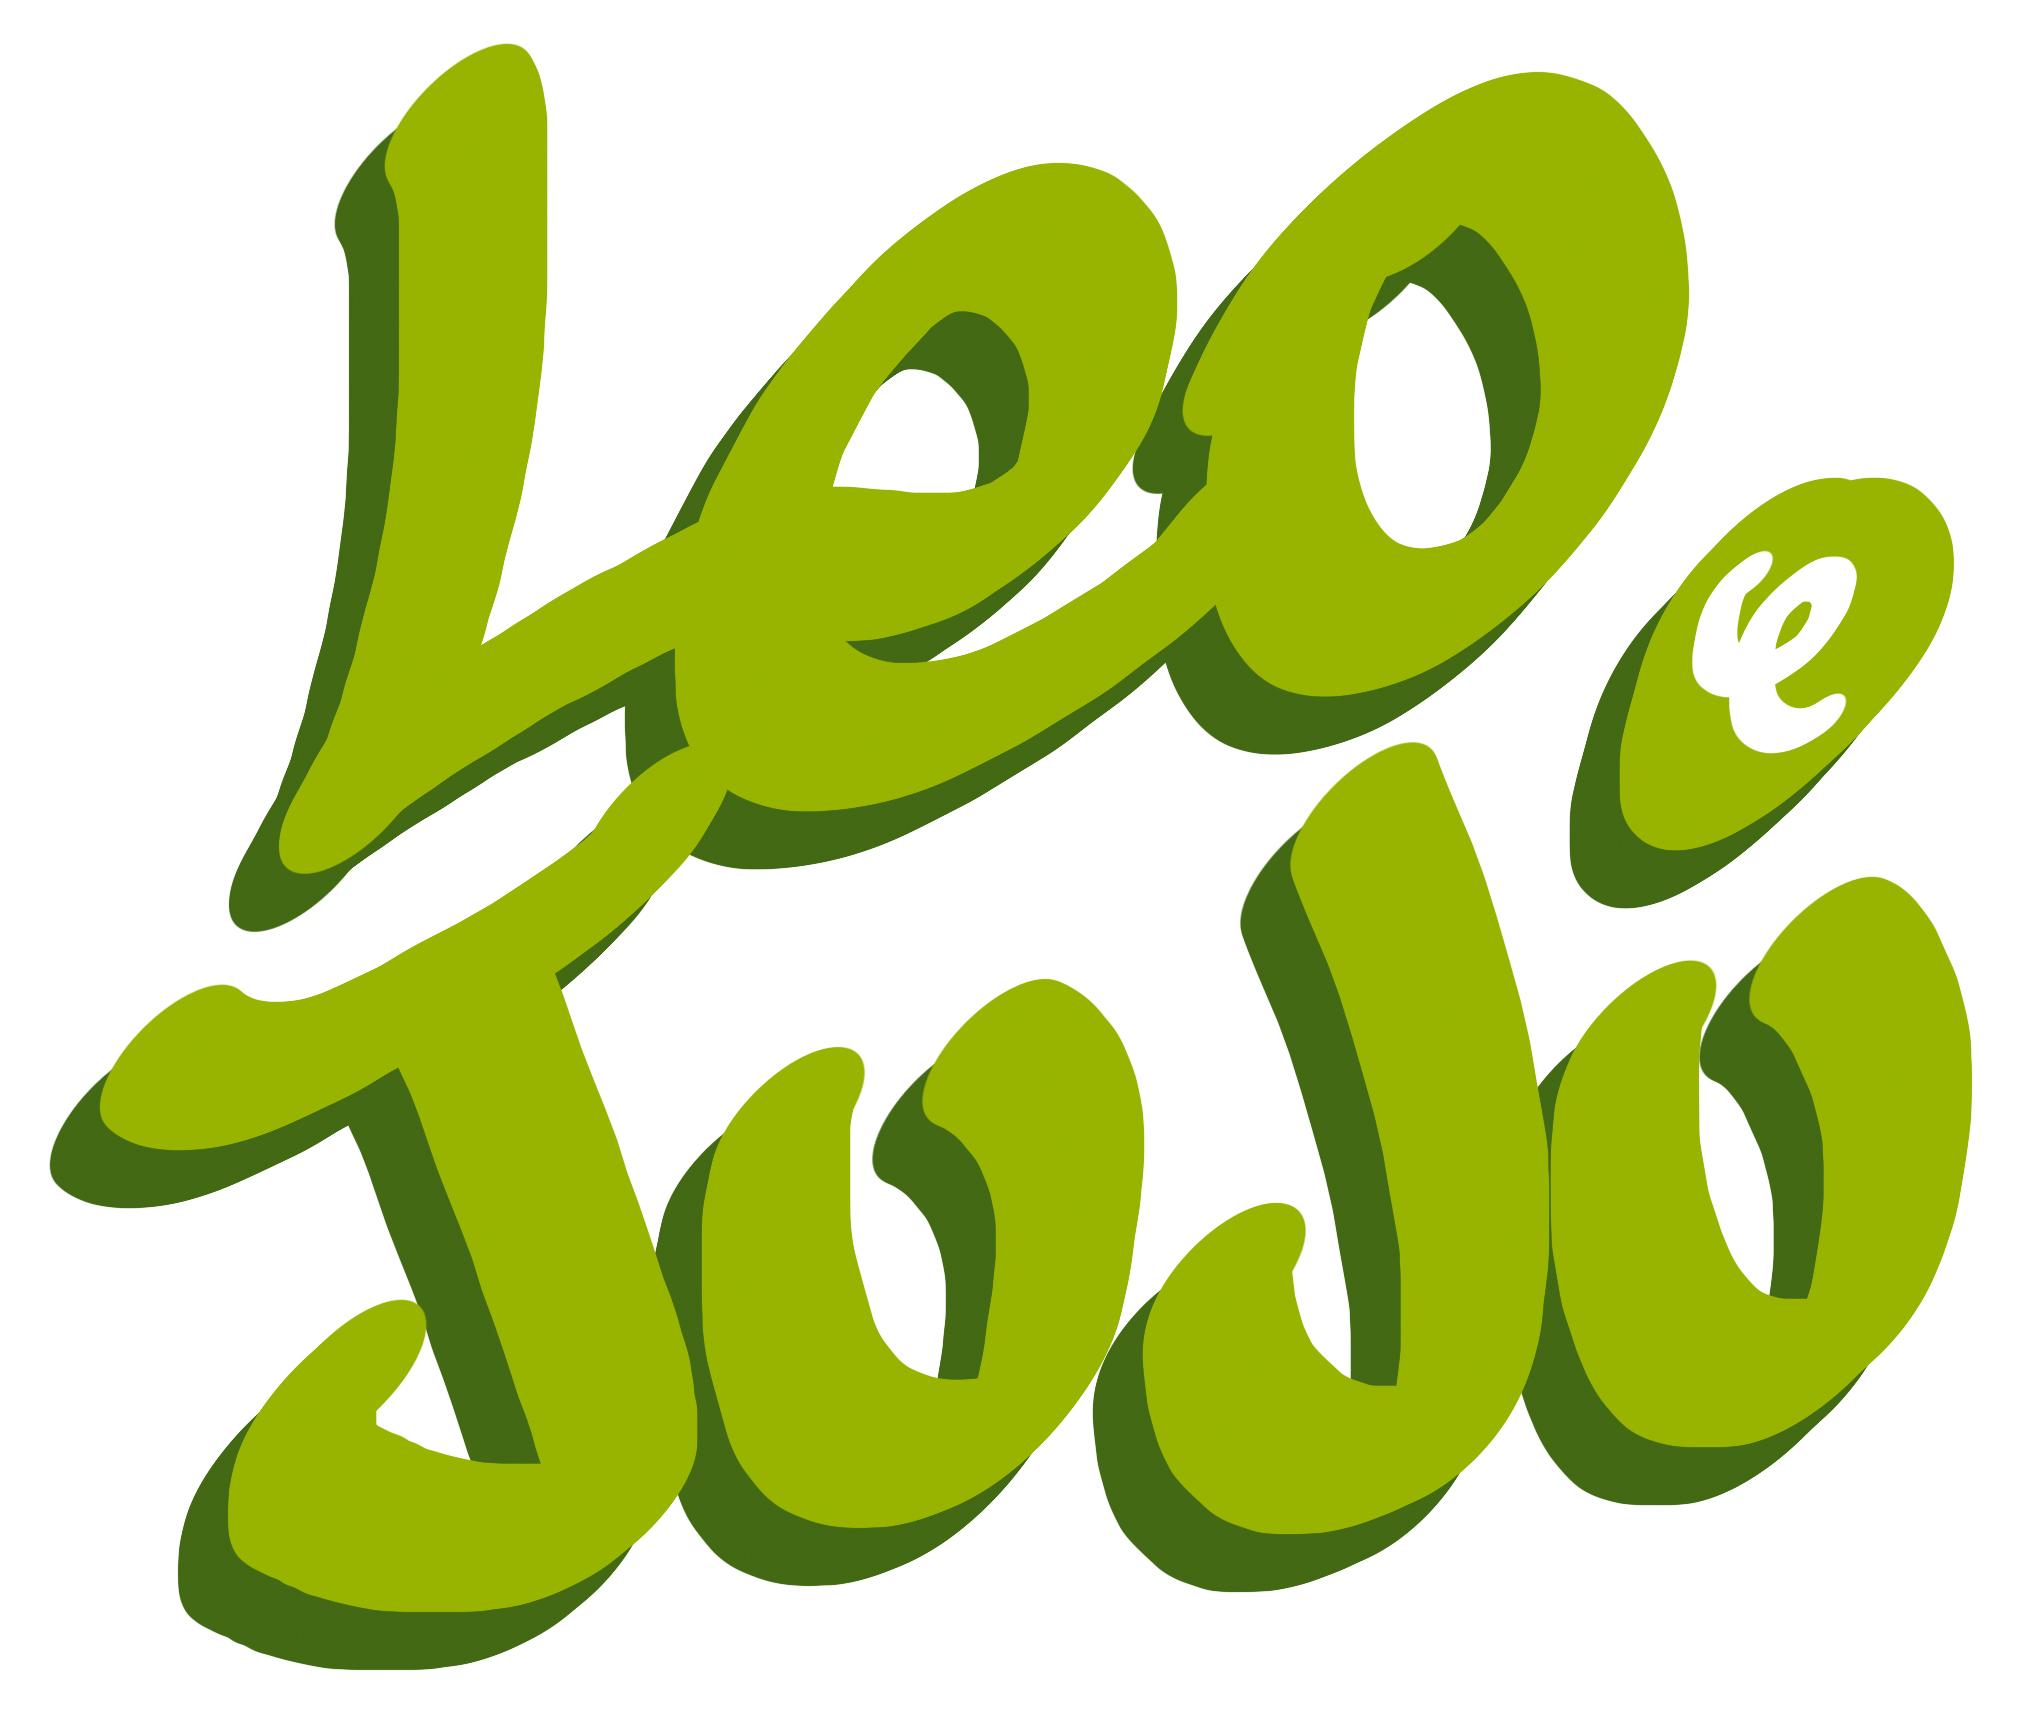 Logo Leo e Juju